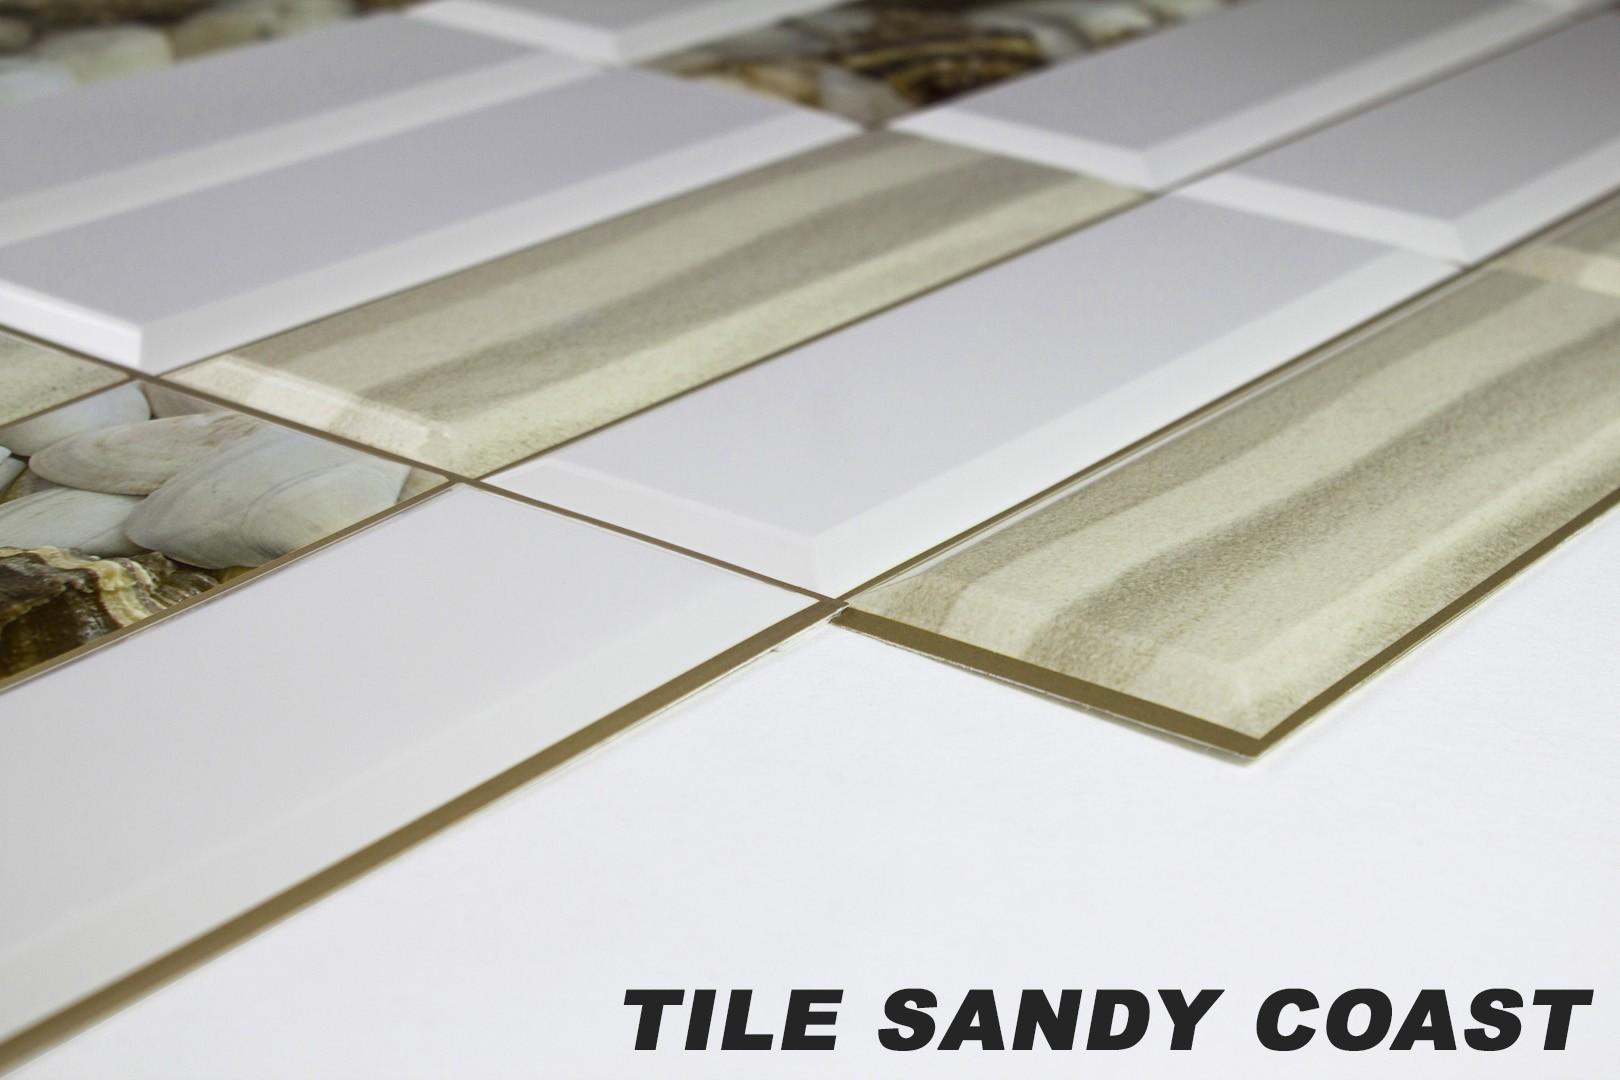 1 pvc dekorplatte mosaic wandverkleidung platten 95x48cm tile sandy coast wand dekorplatten. Black Bedroom Furniture Sets. Home Design Ideas